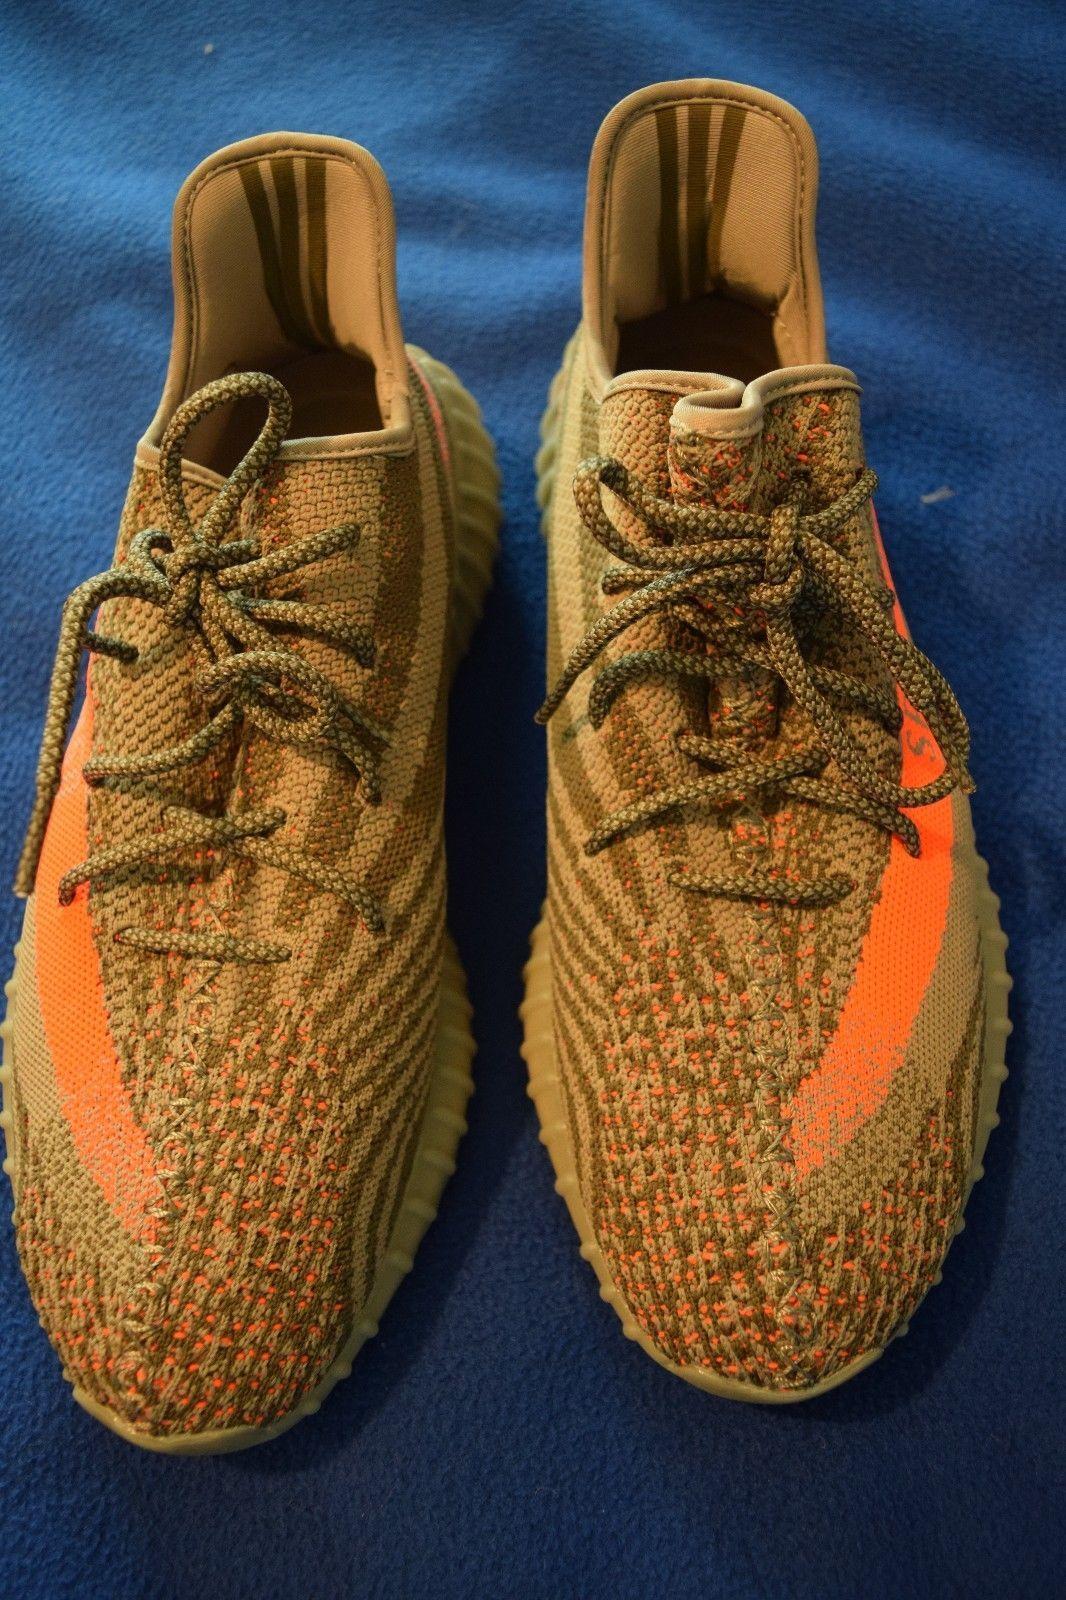 f7c47c21 FAKE Yeezy Boost 350 V2 Beluga Size 12.5 | Dope fake sneakers ...